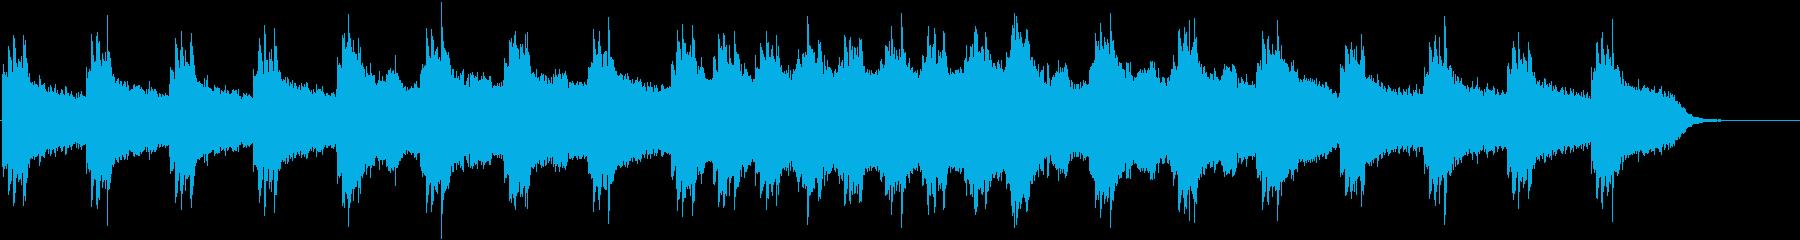 RPGのダンジョン・洞窟・氷の再生済みの波形